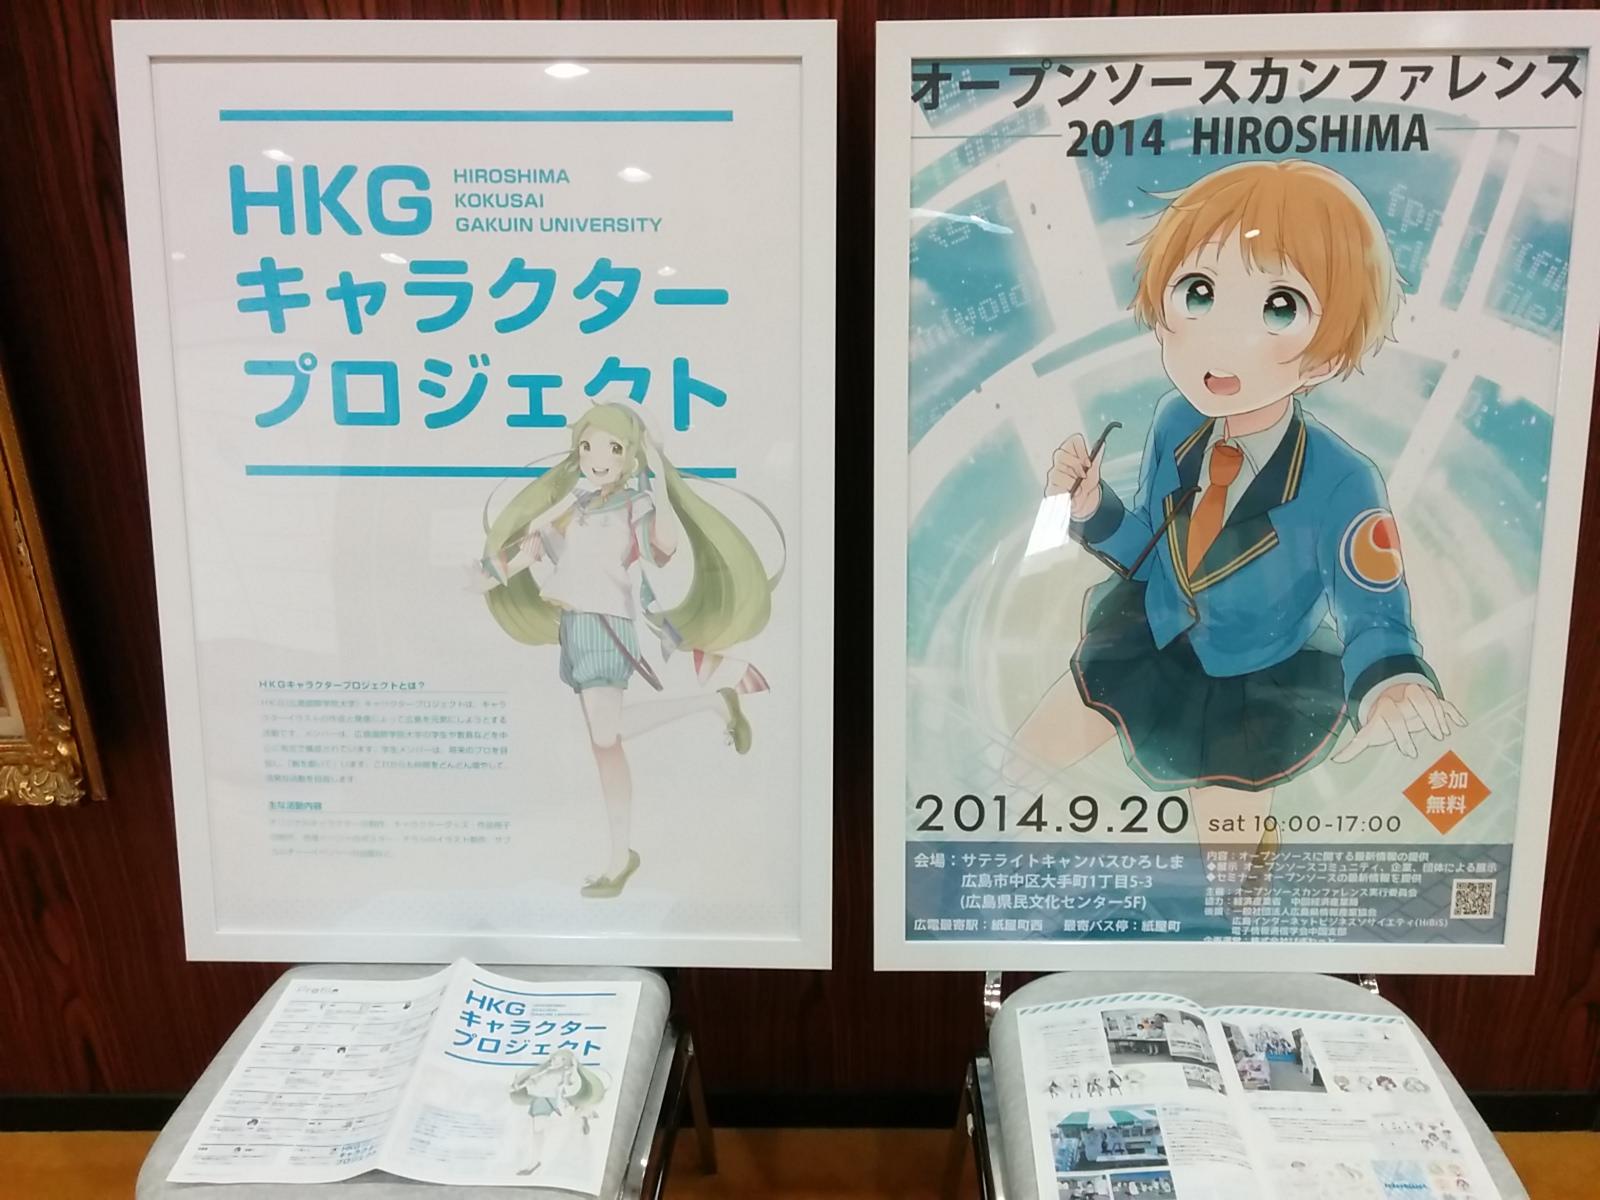 OSC2014 Hiroshima ポスター